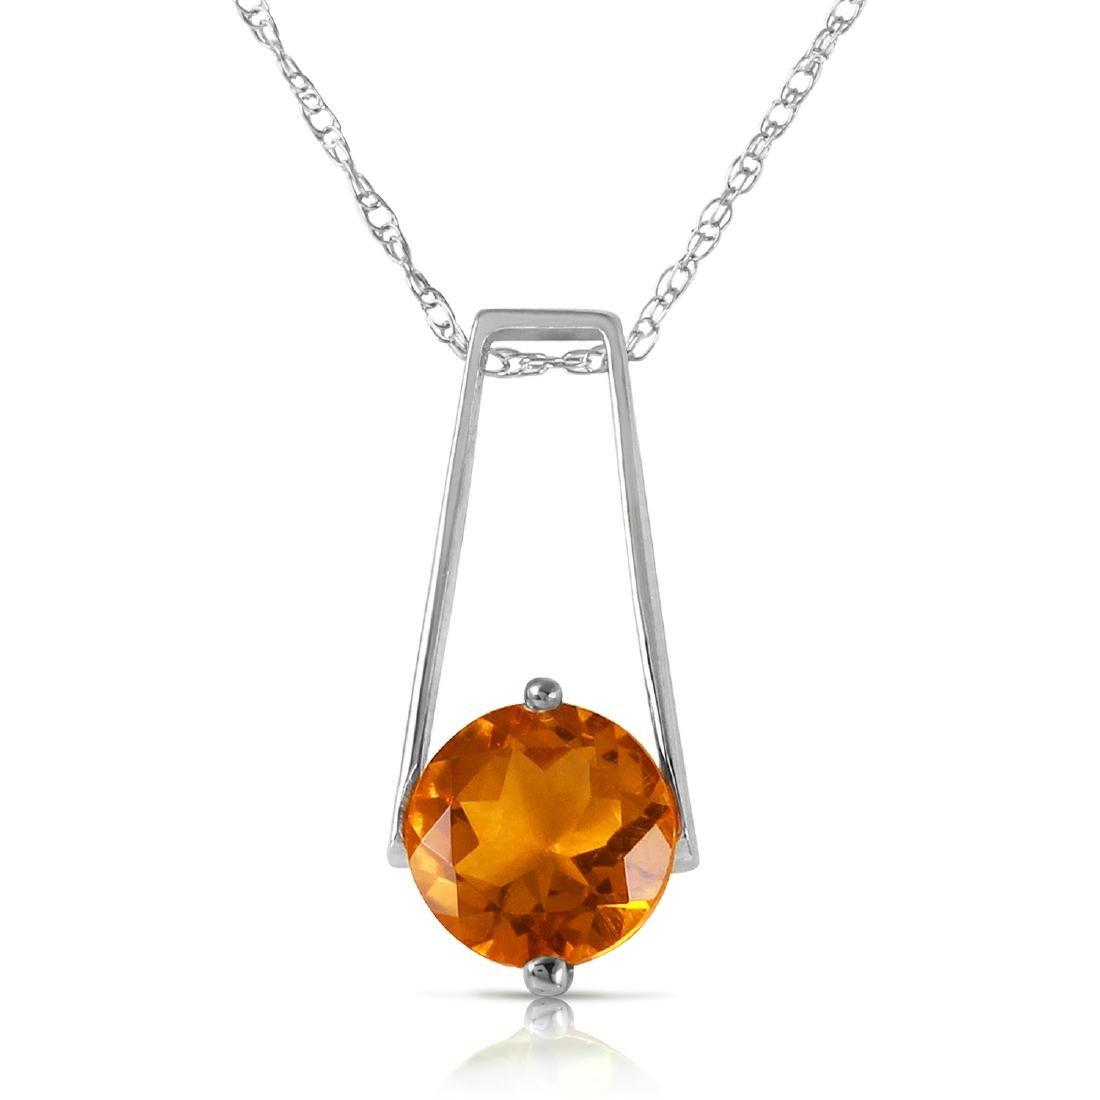 Genuine 1.45 ctw Citrine Necklace Jewelry 14KT White